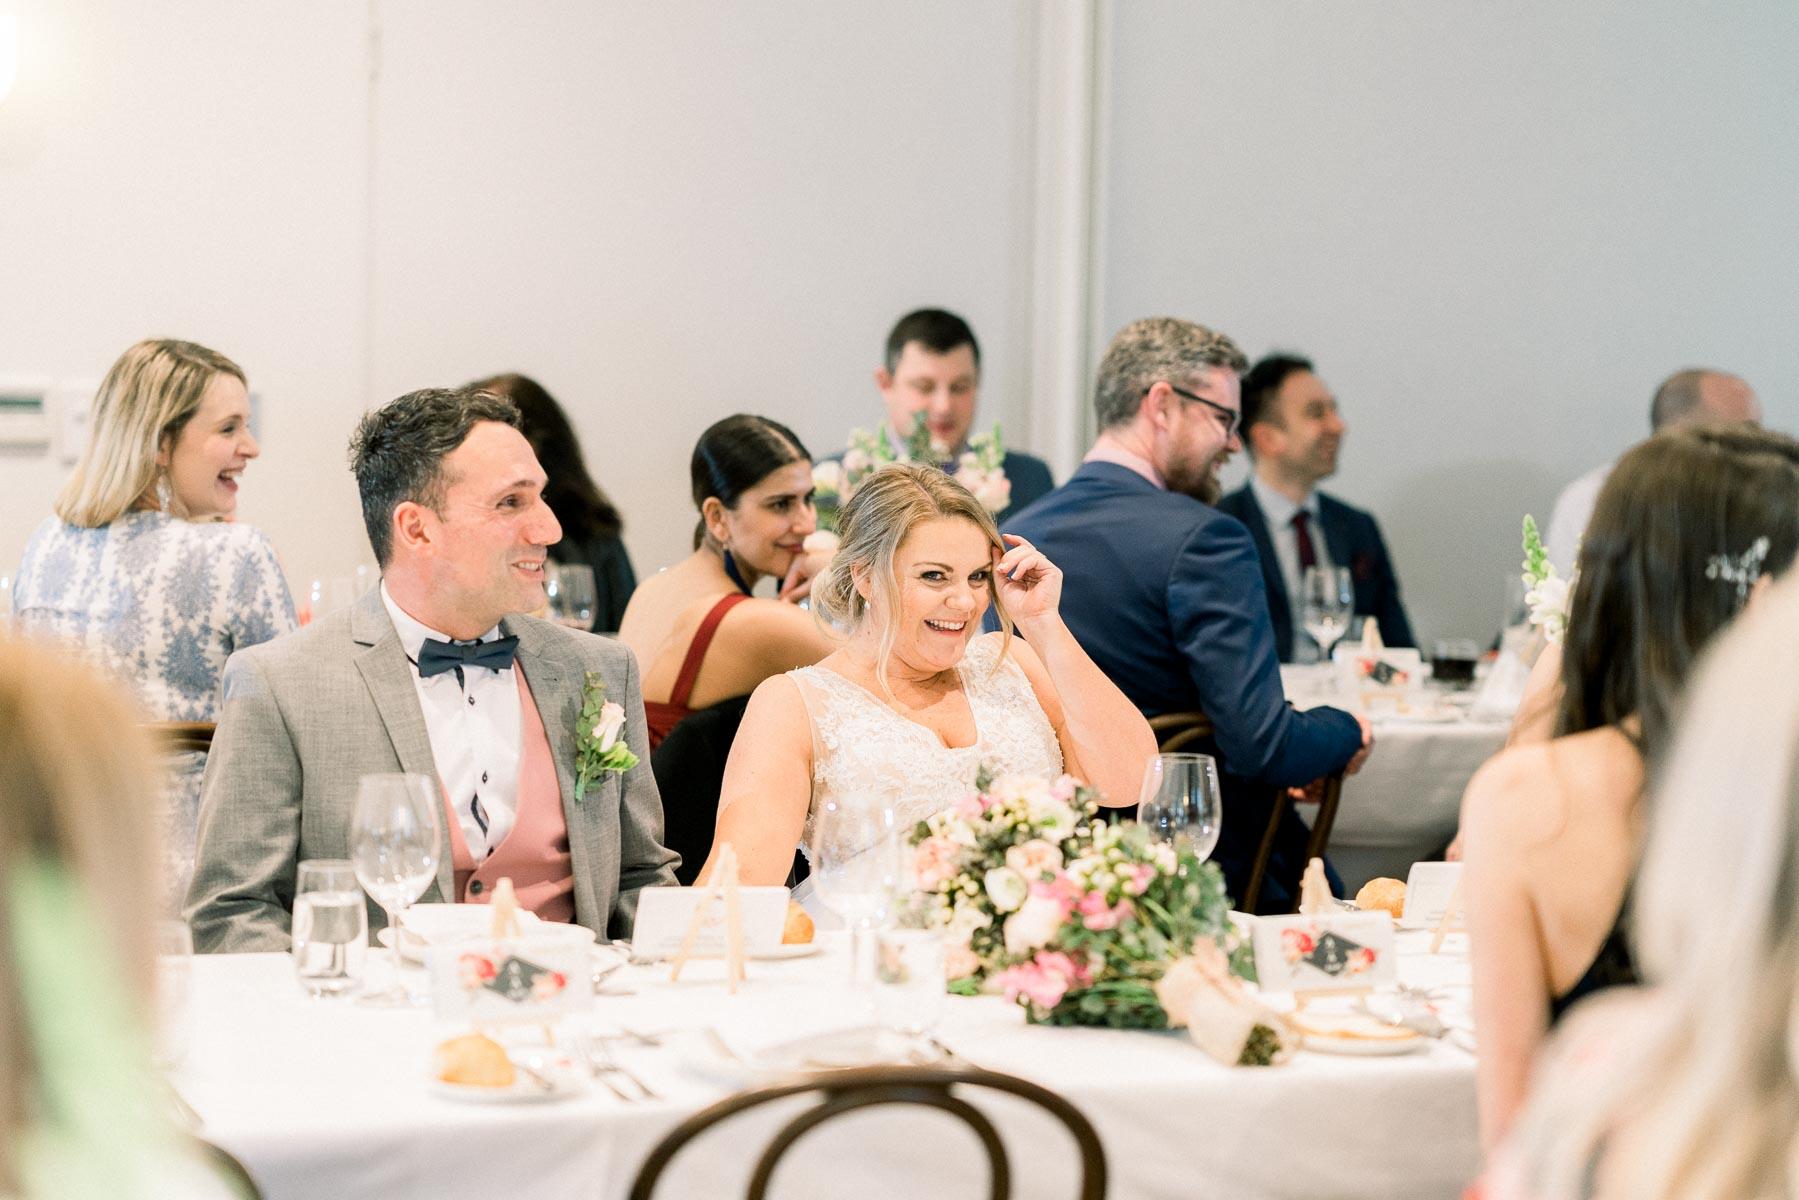 lindenderry-wedding-heart+soul-weddings-amy-alain-03893.jpg